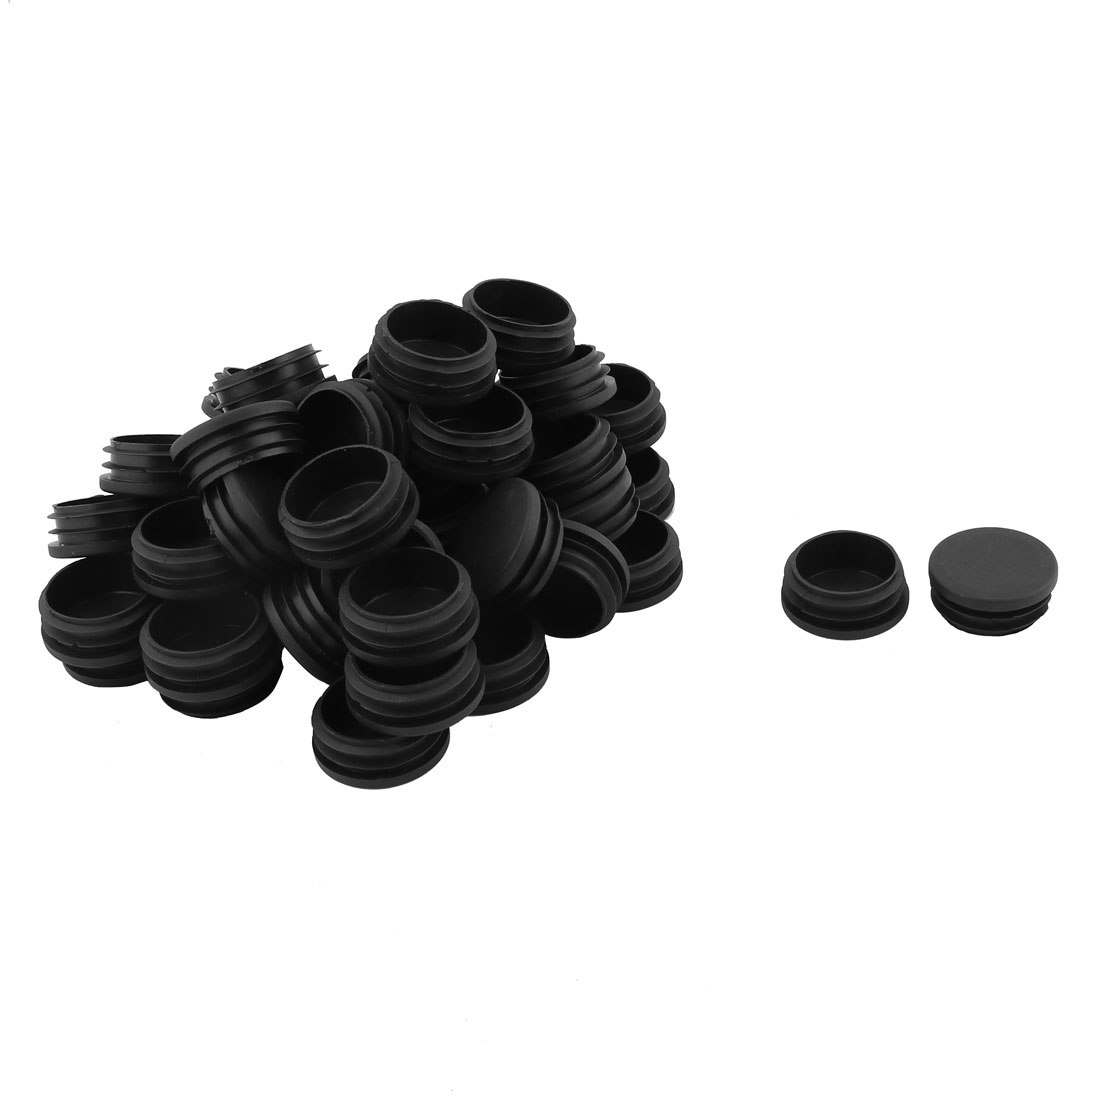 Home Office Plastic Round Shaped Furniture Table Chair Leg Foot Tube Insert Black 4cm Diameter 50 Pcs